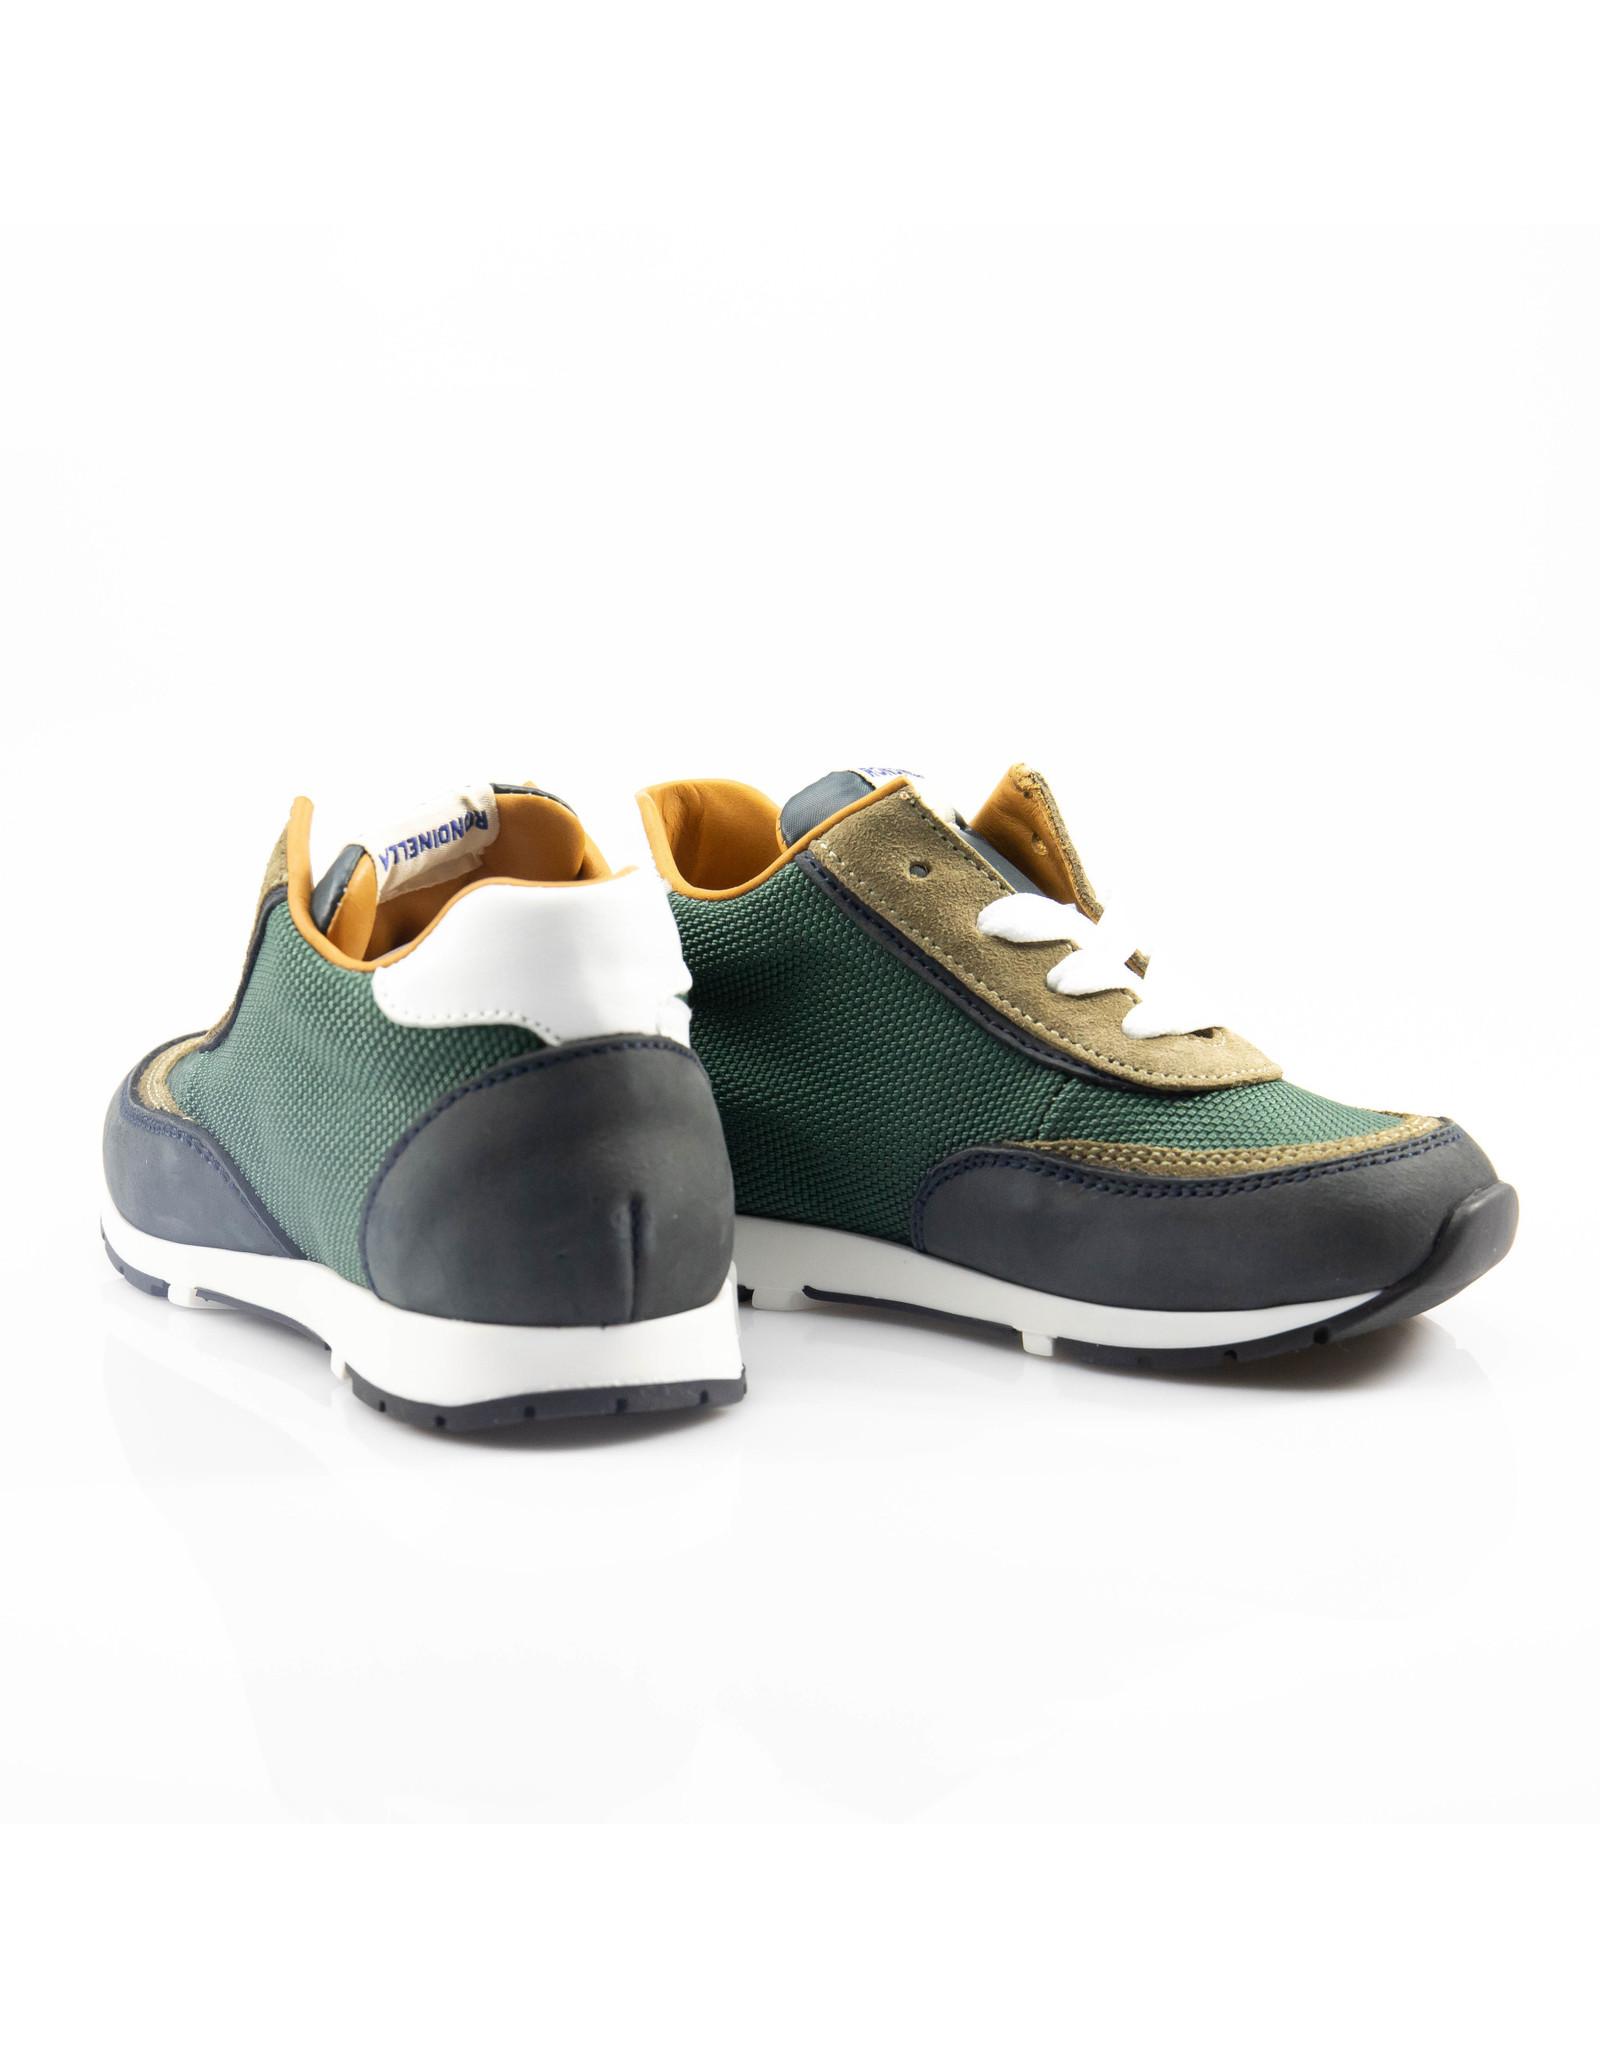 Rondinella runner mini blauw, groen